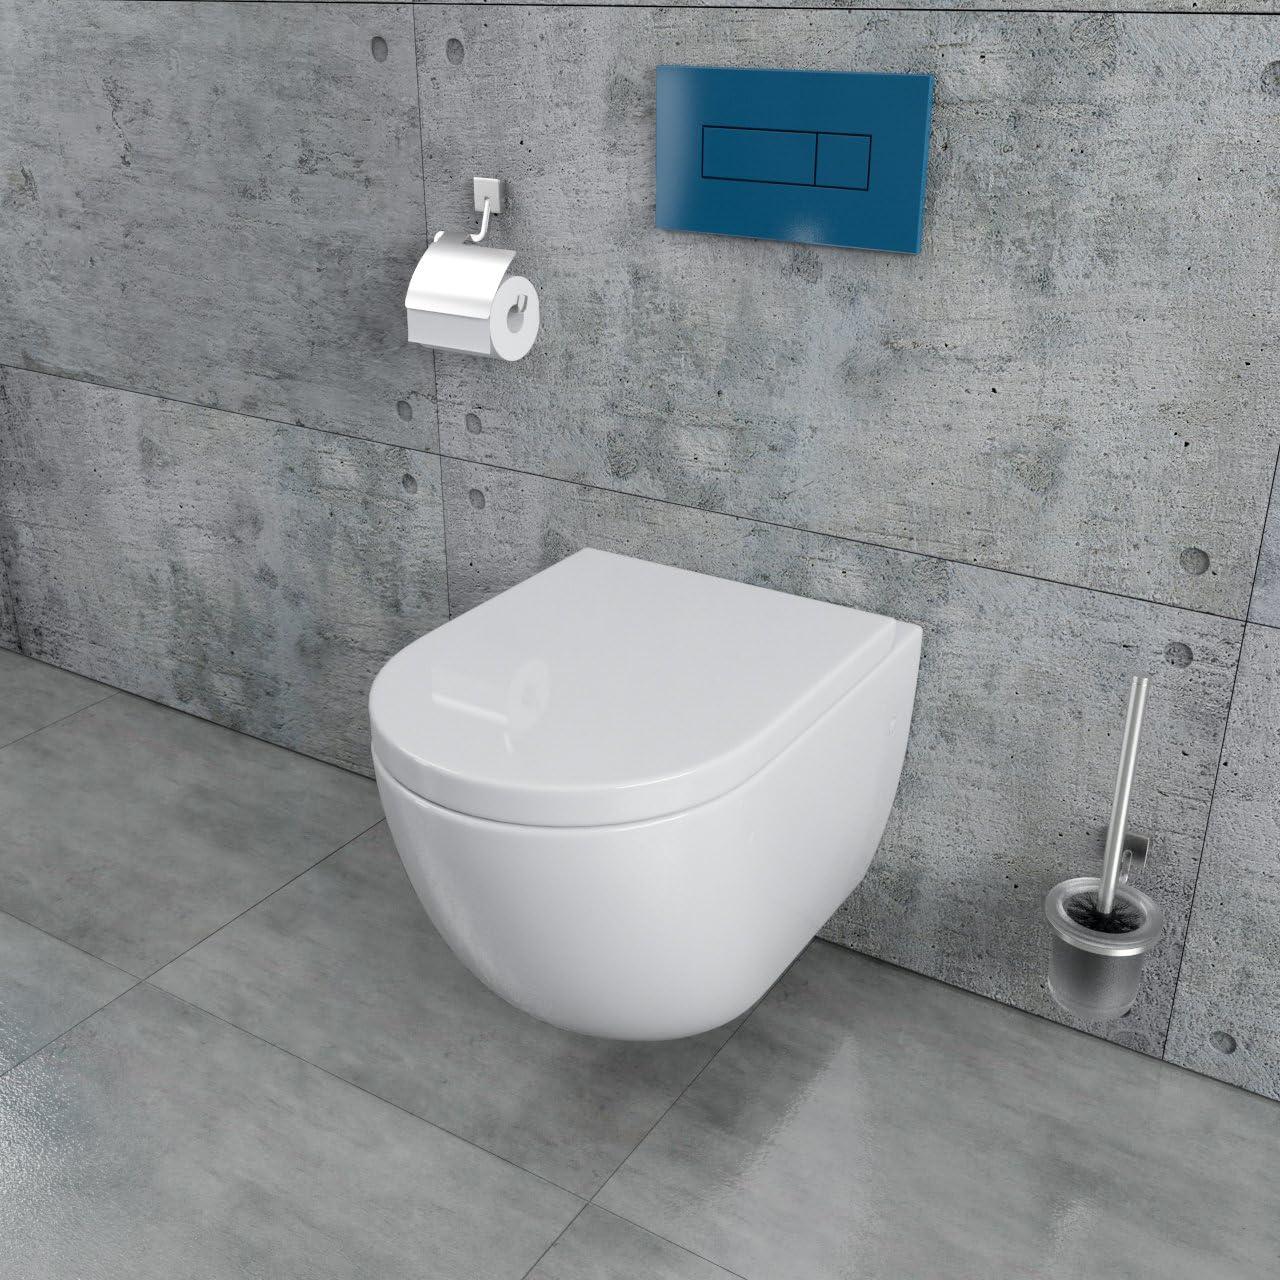 Wand Bidet inkl WC Sitz aus Duroplast mit Absenkautomatik Randlos Sp/ülrandlos KB76-1-set Randloses Design Keramik Wand H/änge WC Toilette